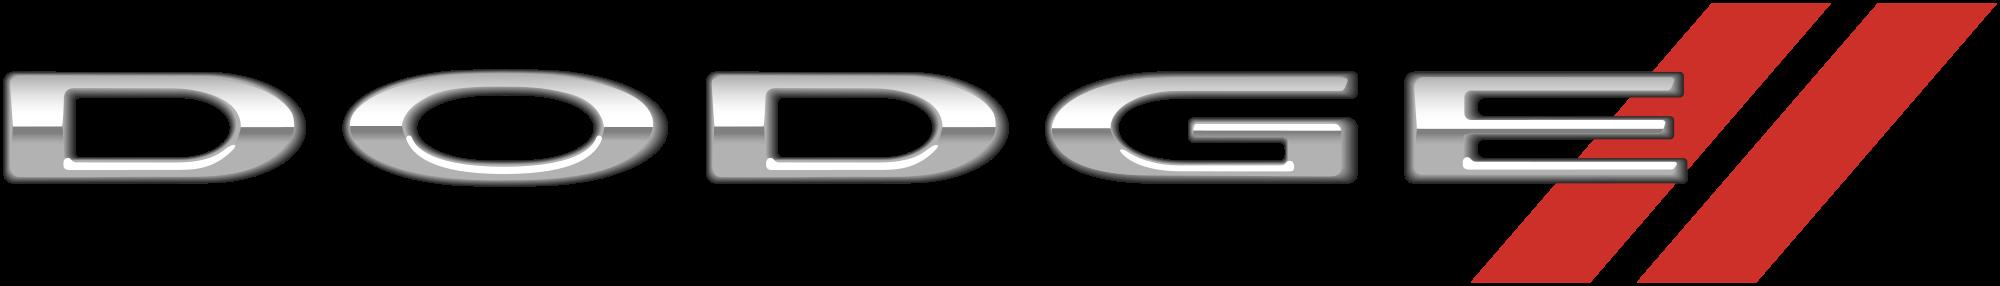 Alfa romeo symbol wiki